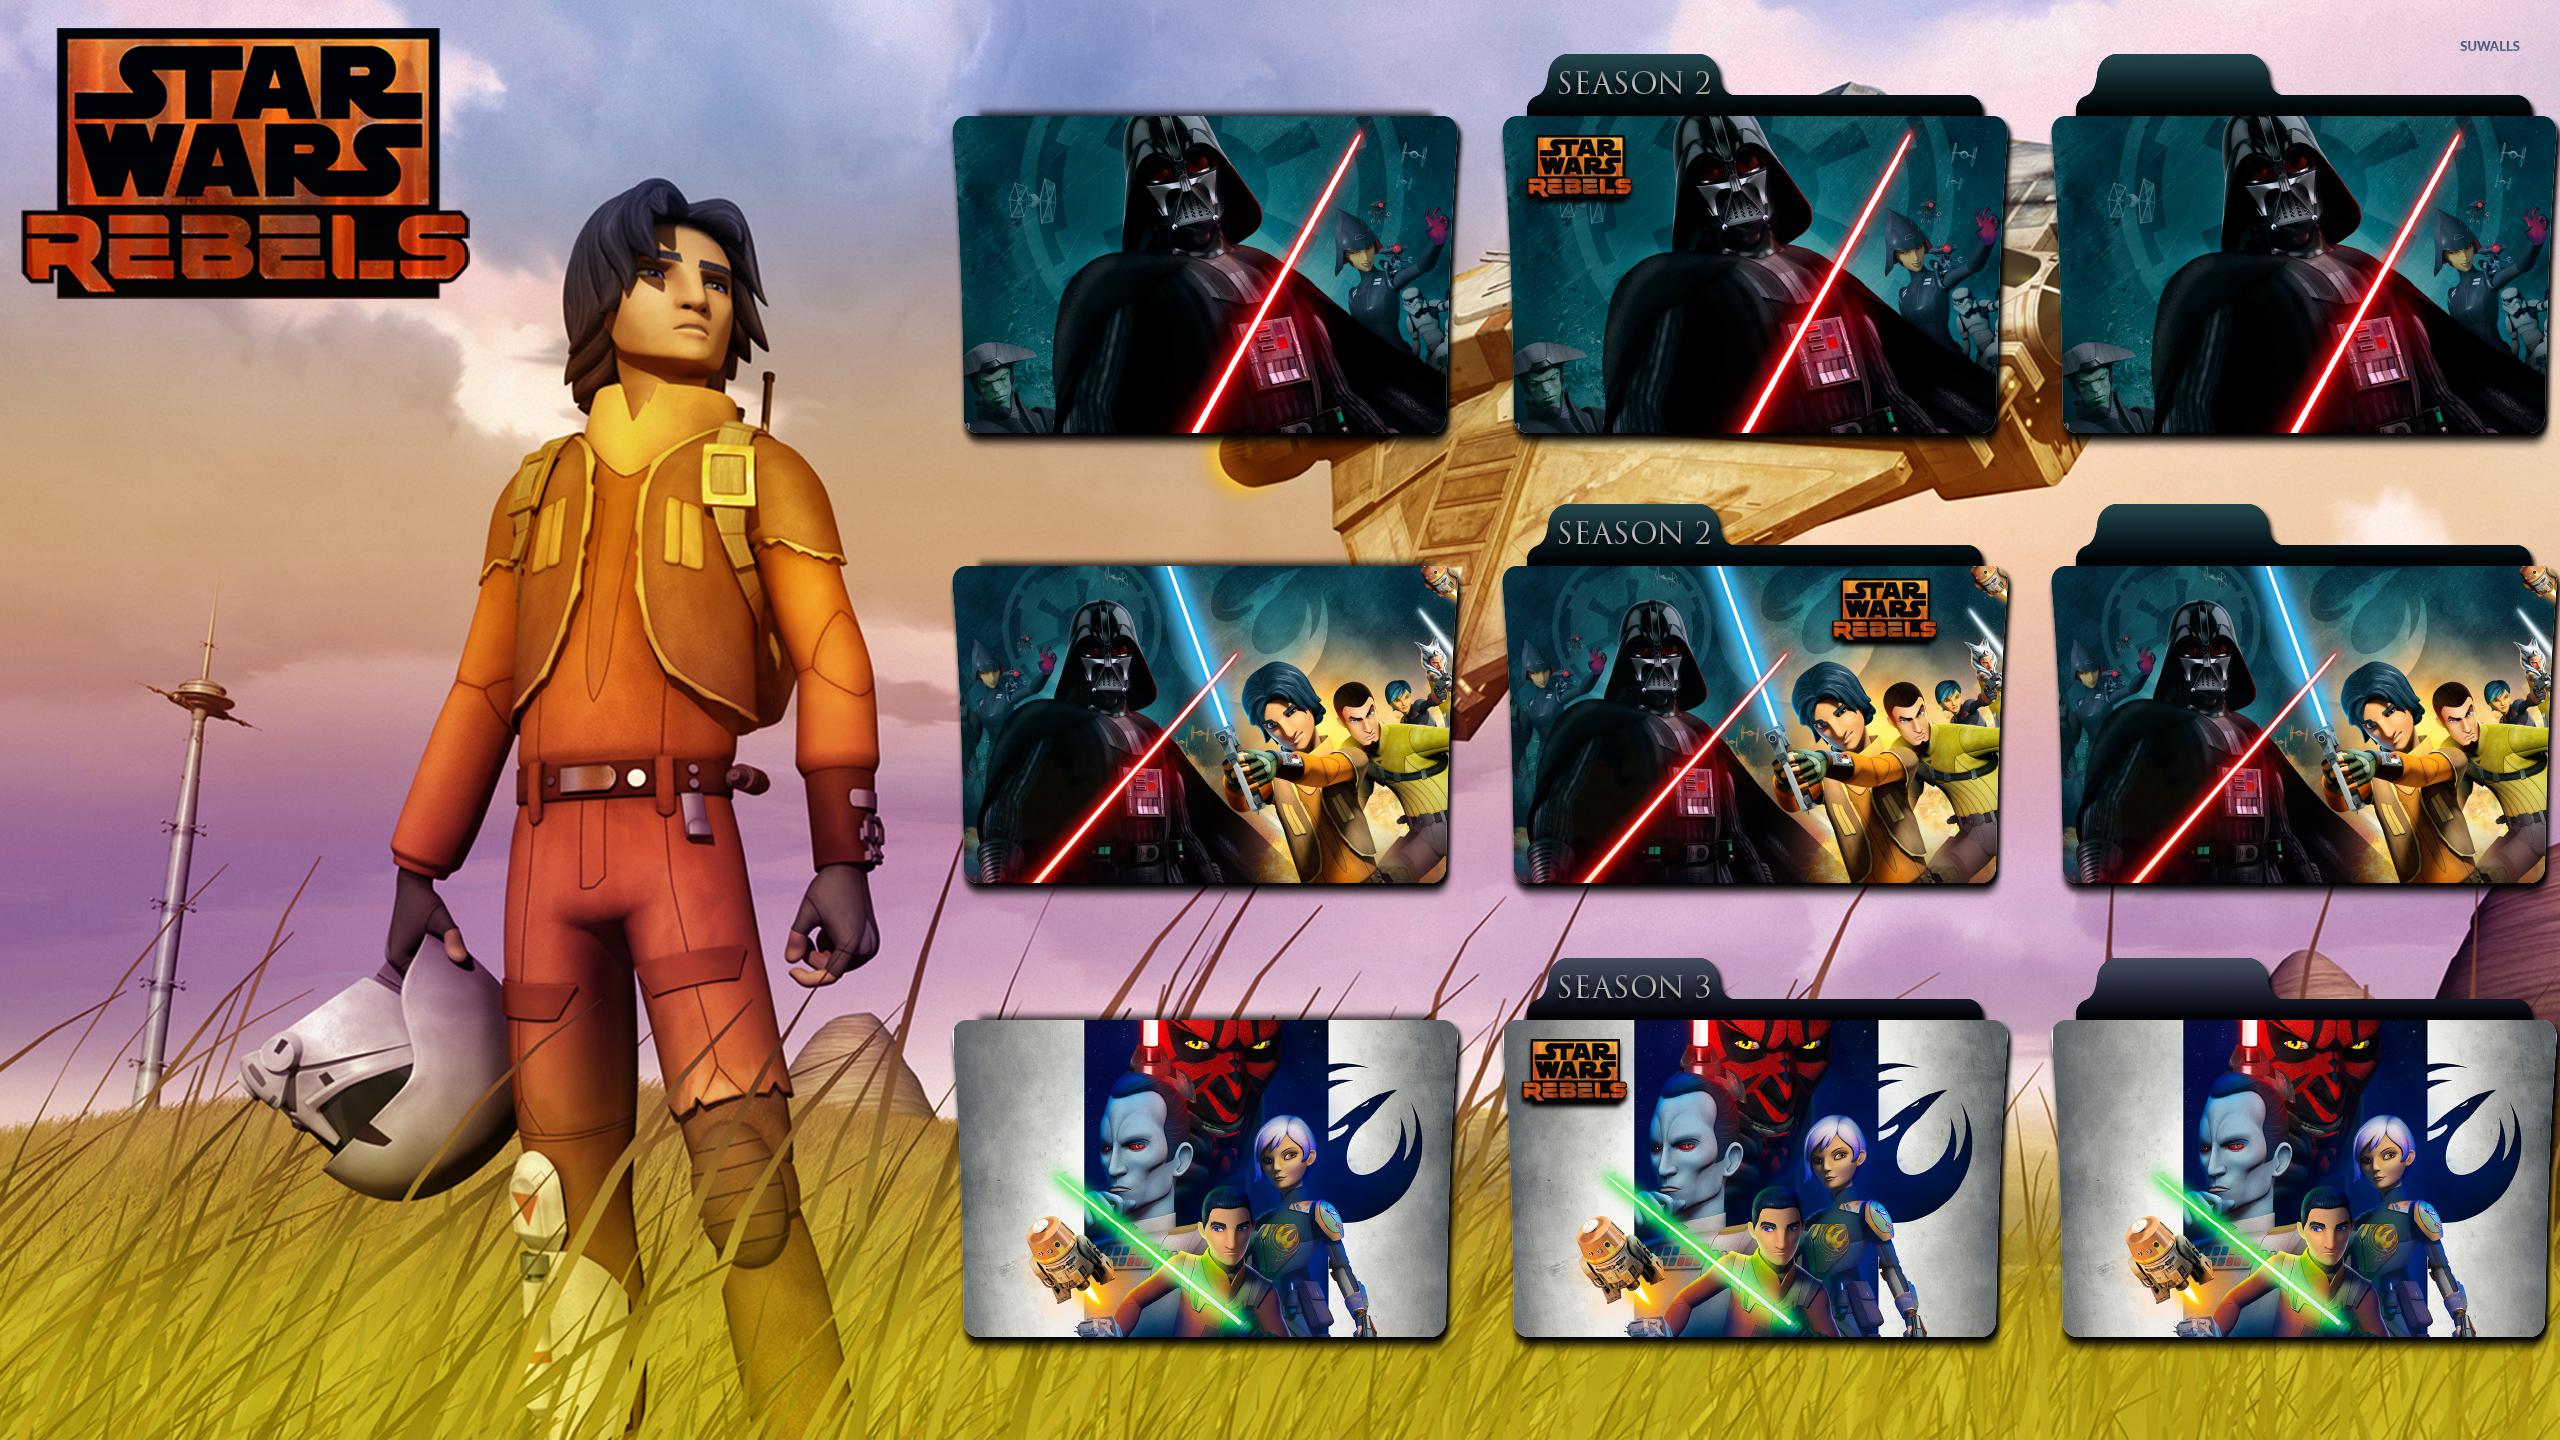 Star Wars Rebels S02 S03 Pack By Deviusant On Deviantart